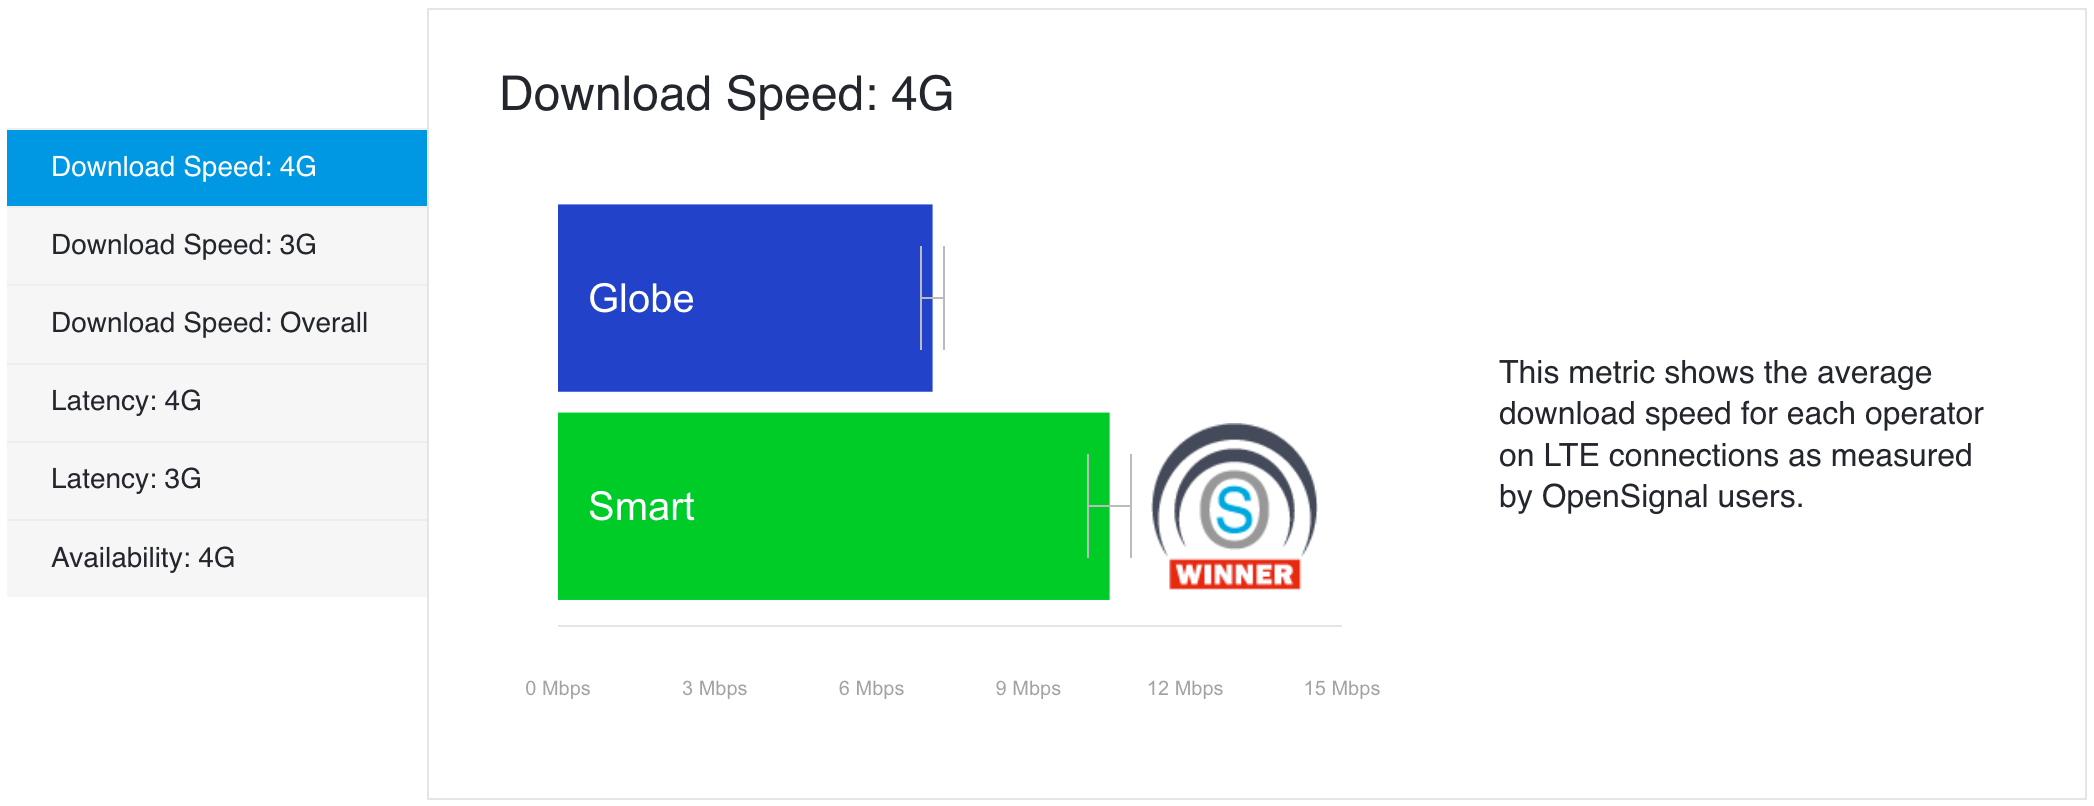 Masbad: The state of LTE - SUNSTAR